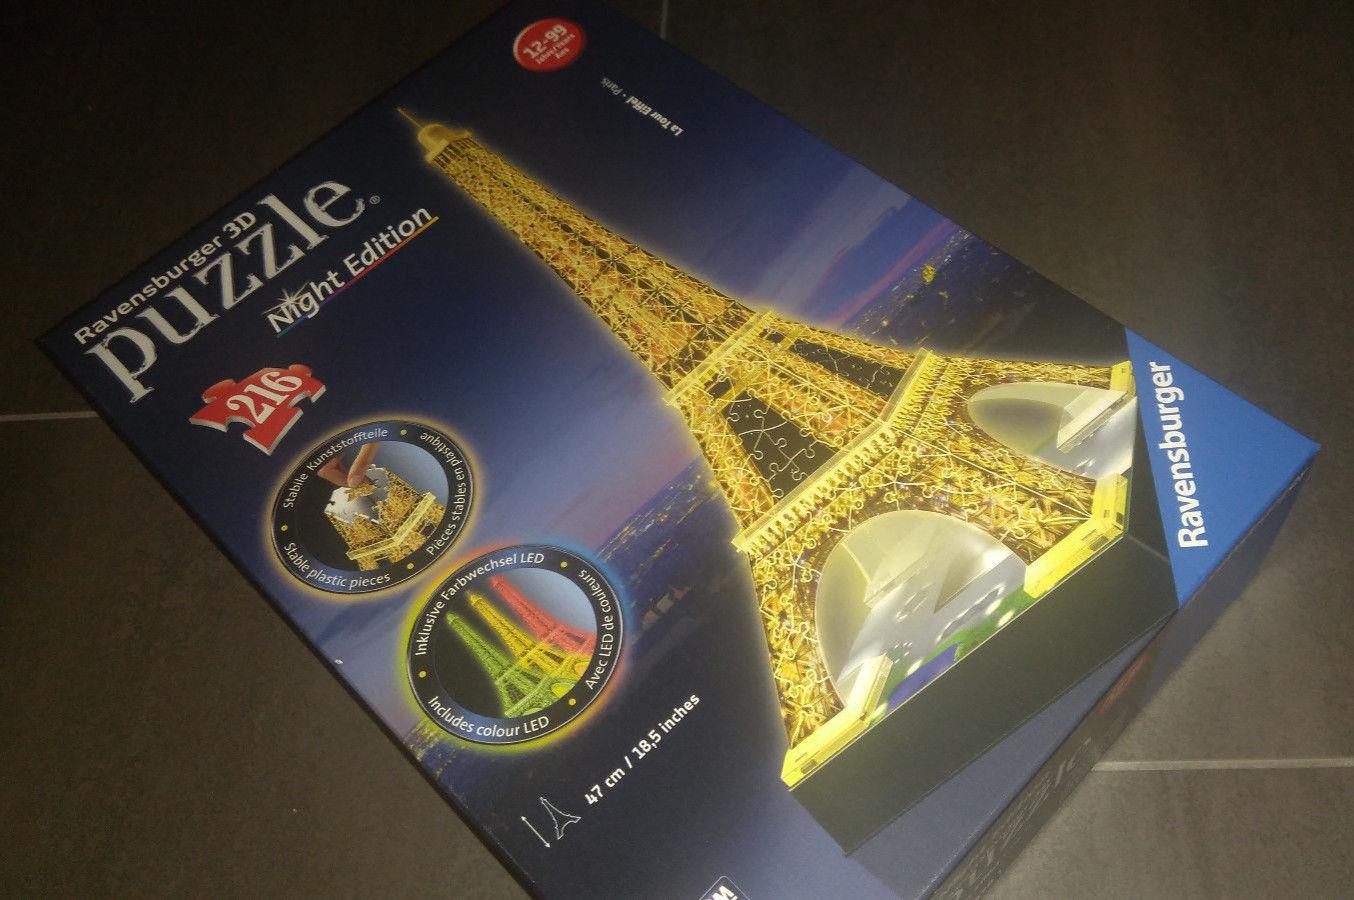 3D Puzzle Ravensburger Night Edition Eifelturm